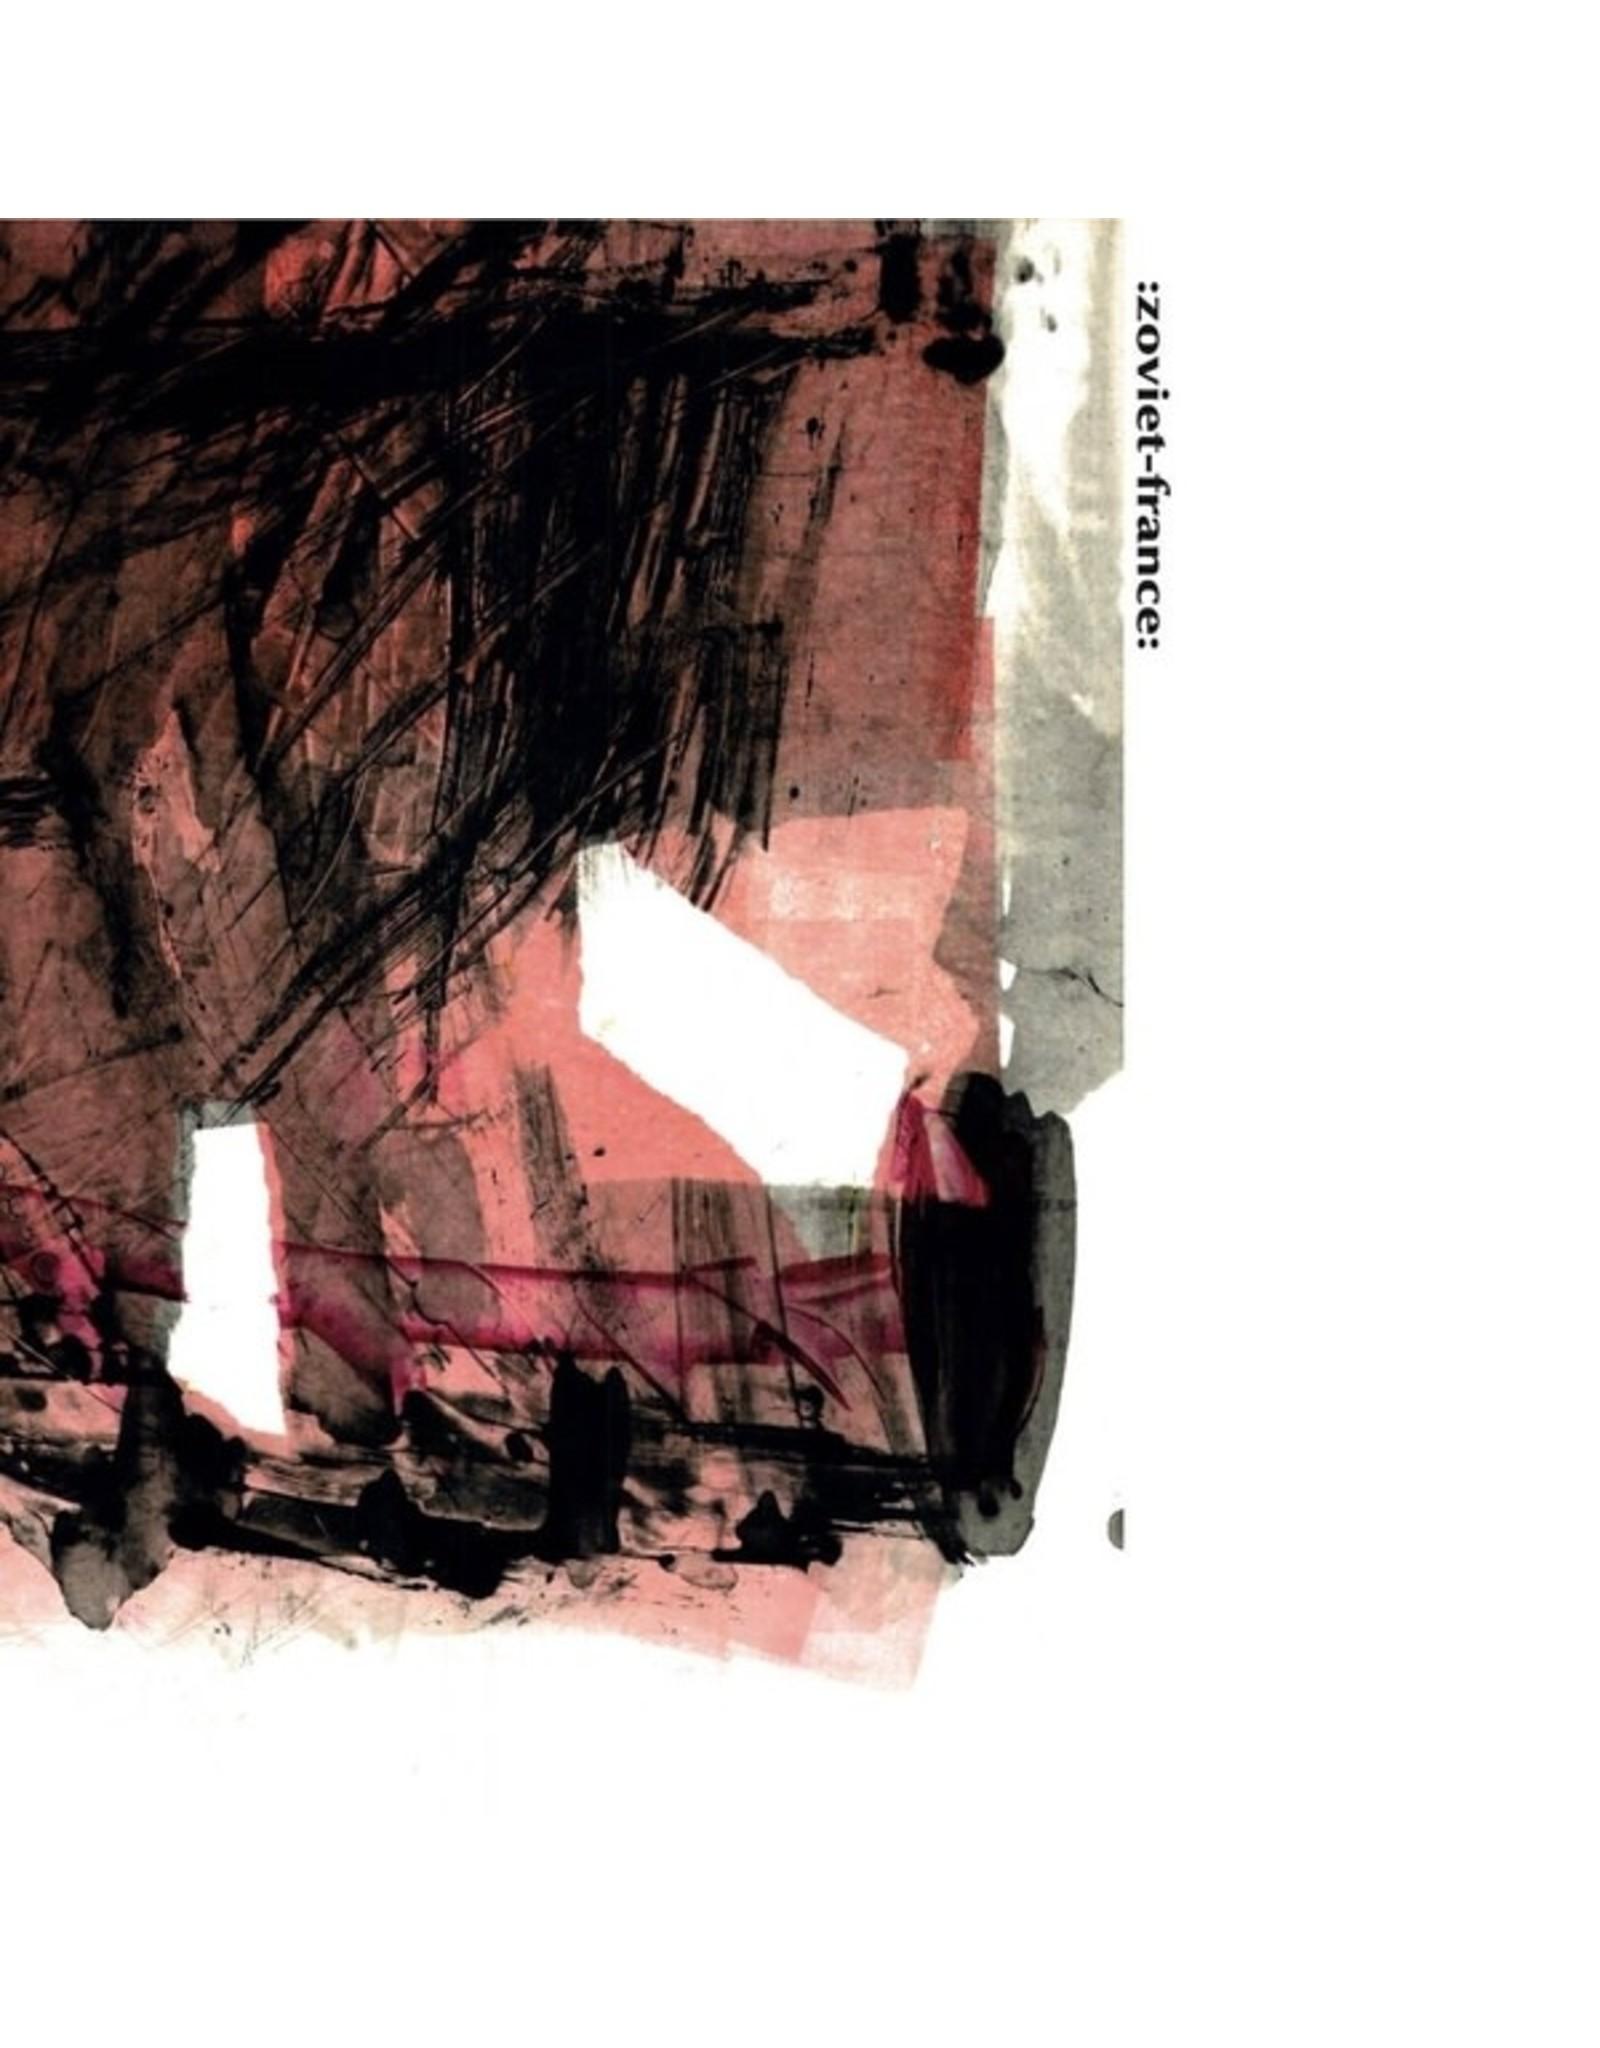 Vinyl on Demand Zoviet France: Loh Land LP